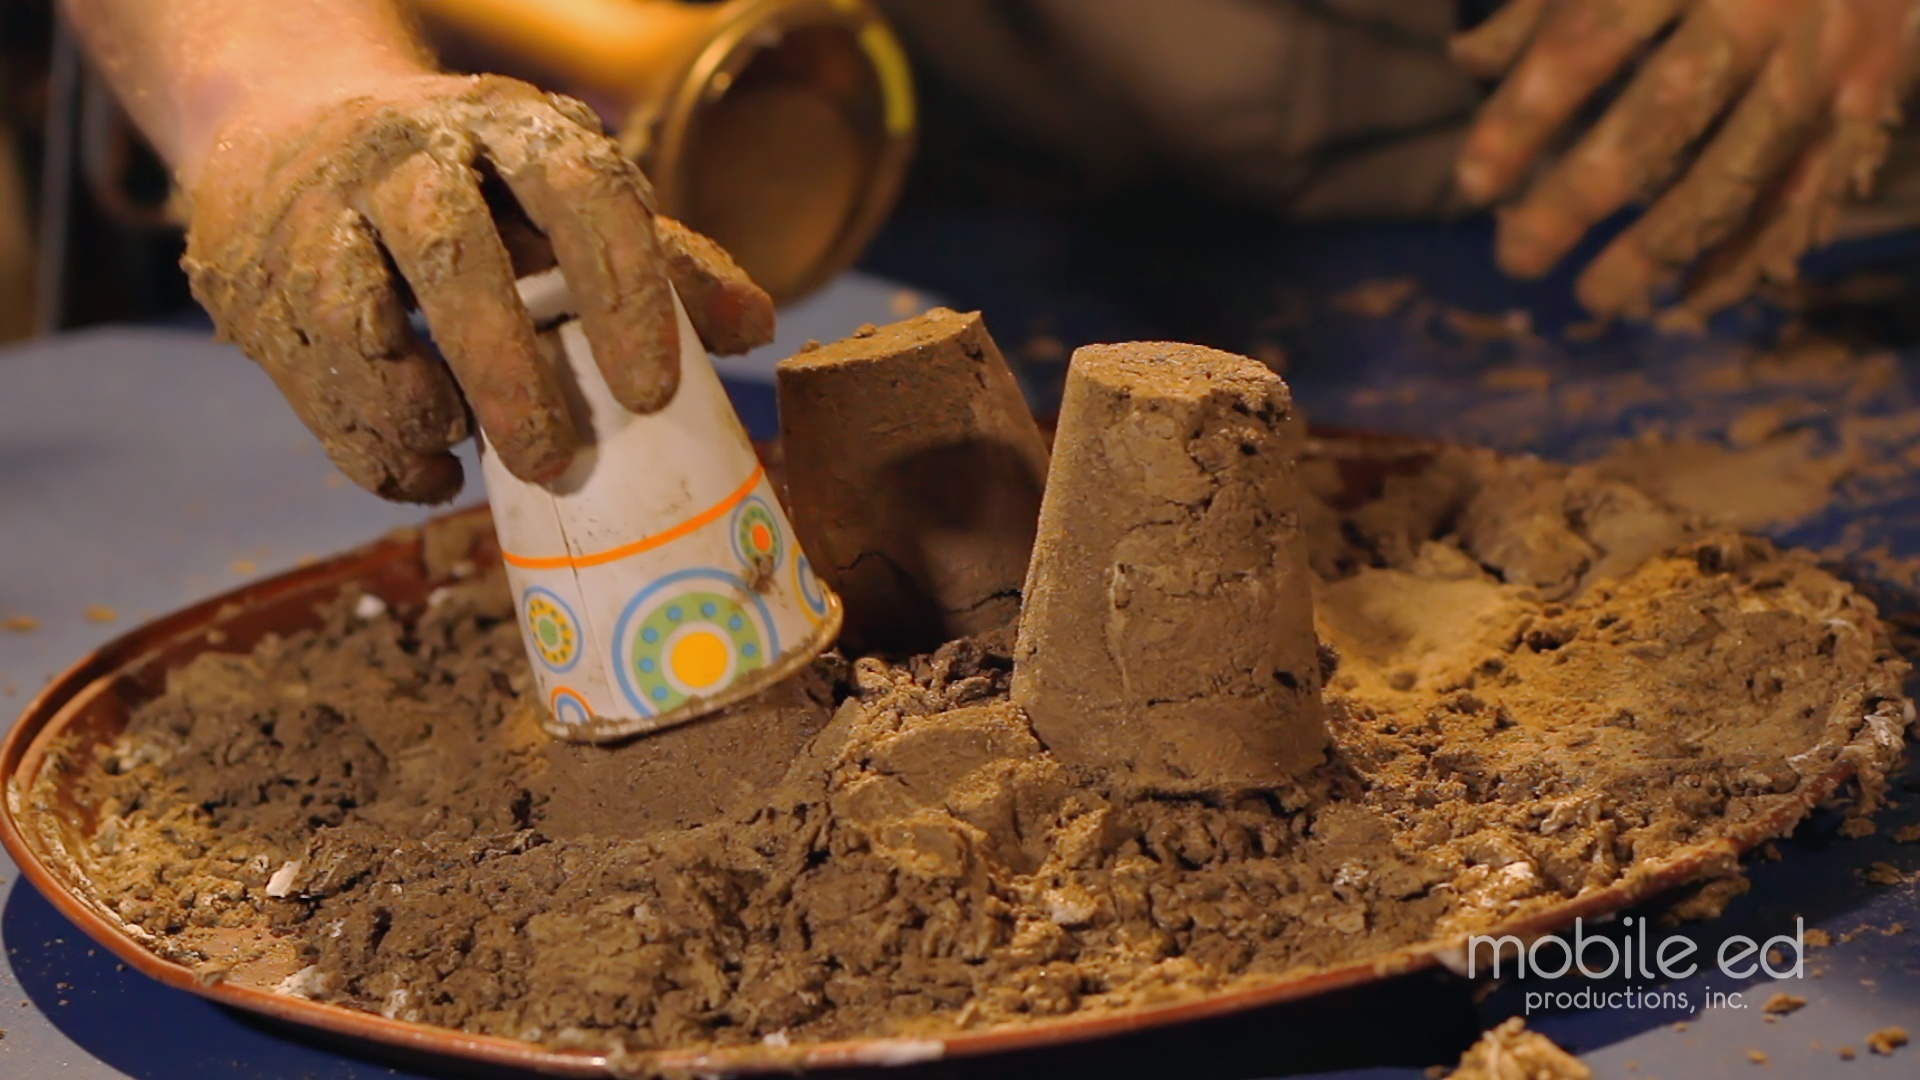 Make Sand Castles! | Handy Dan the Junkyard Man | Mobile Ed Productions